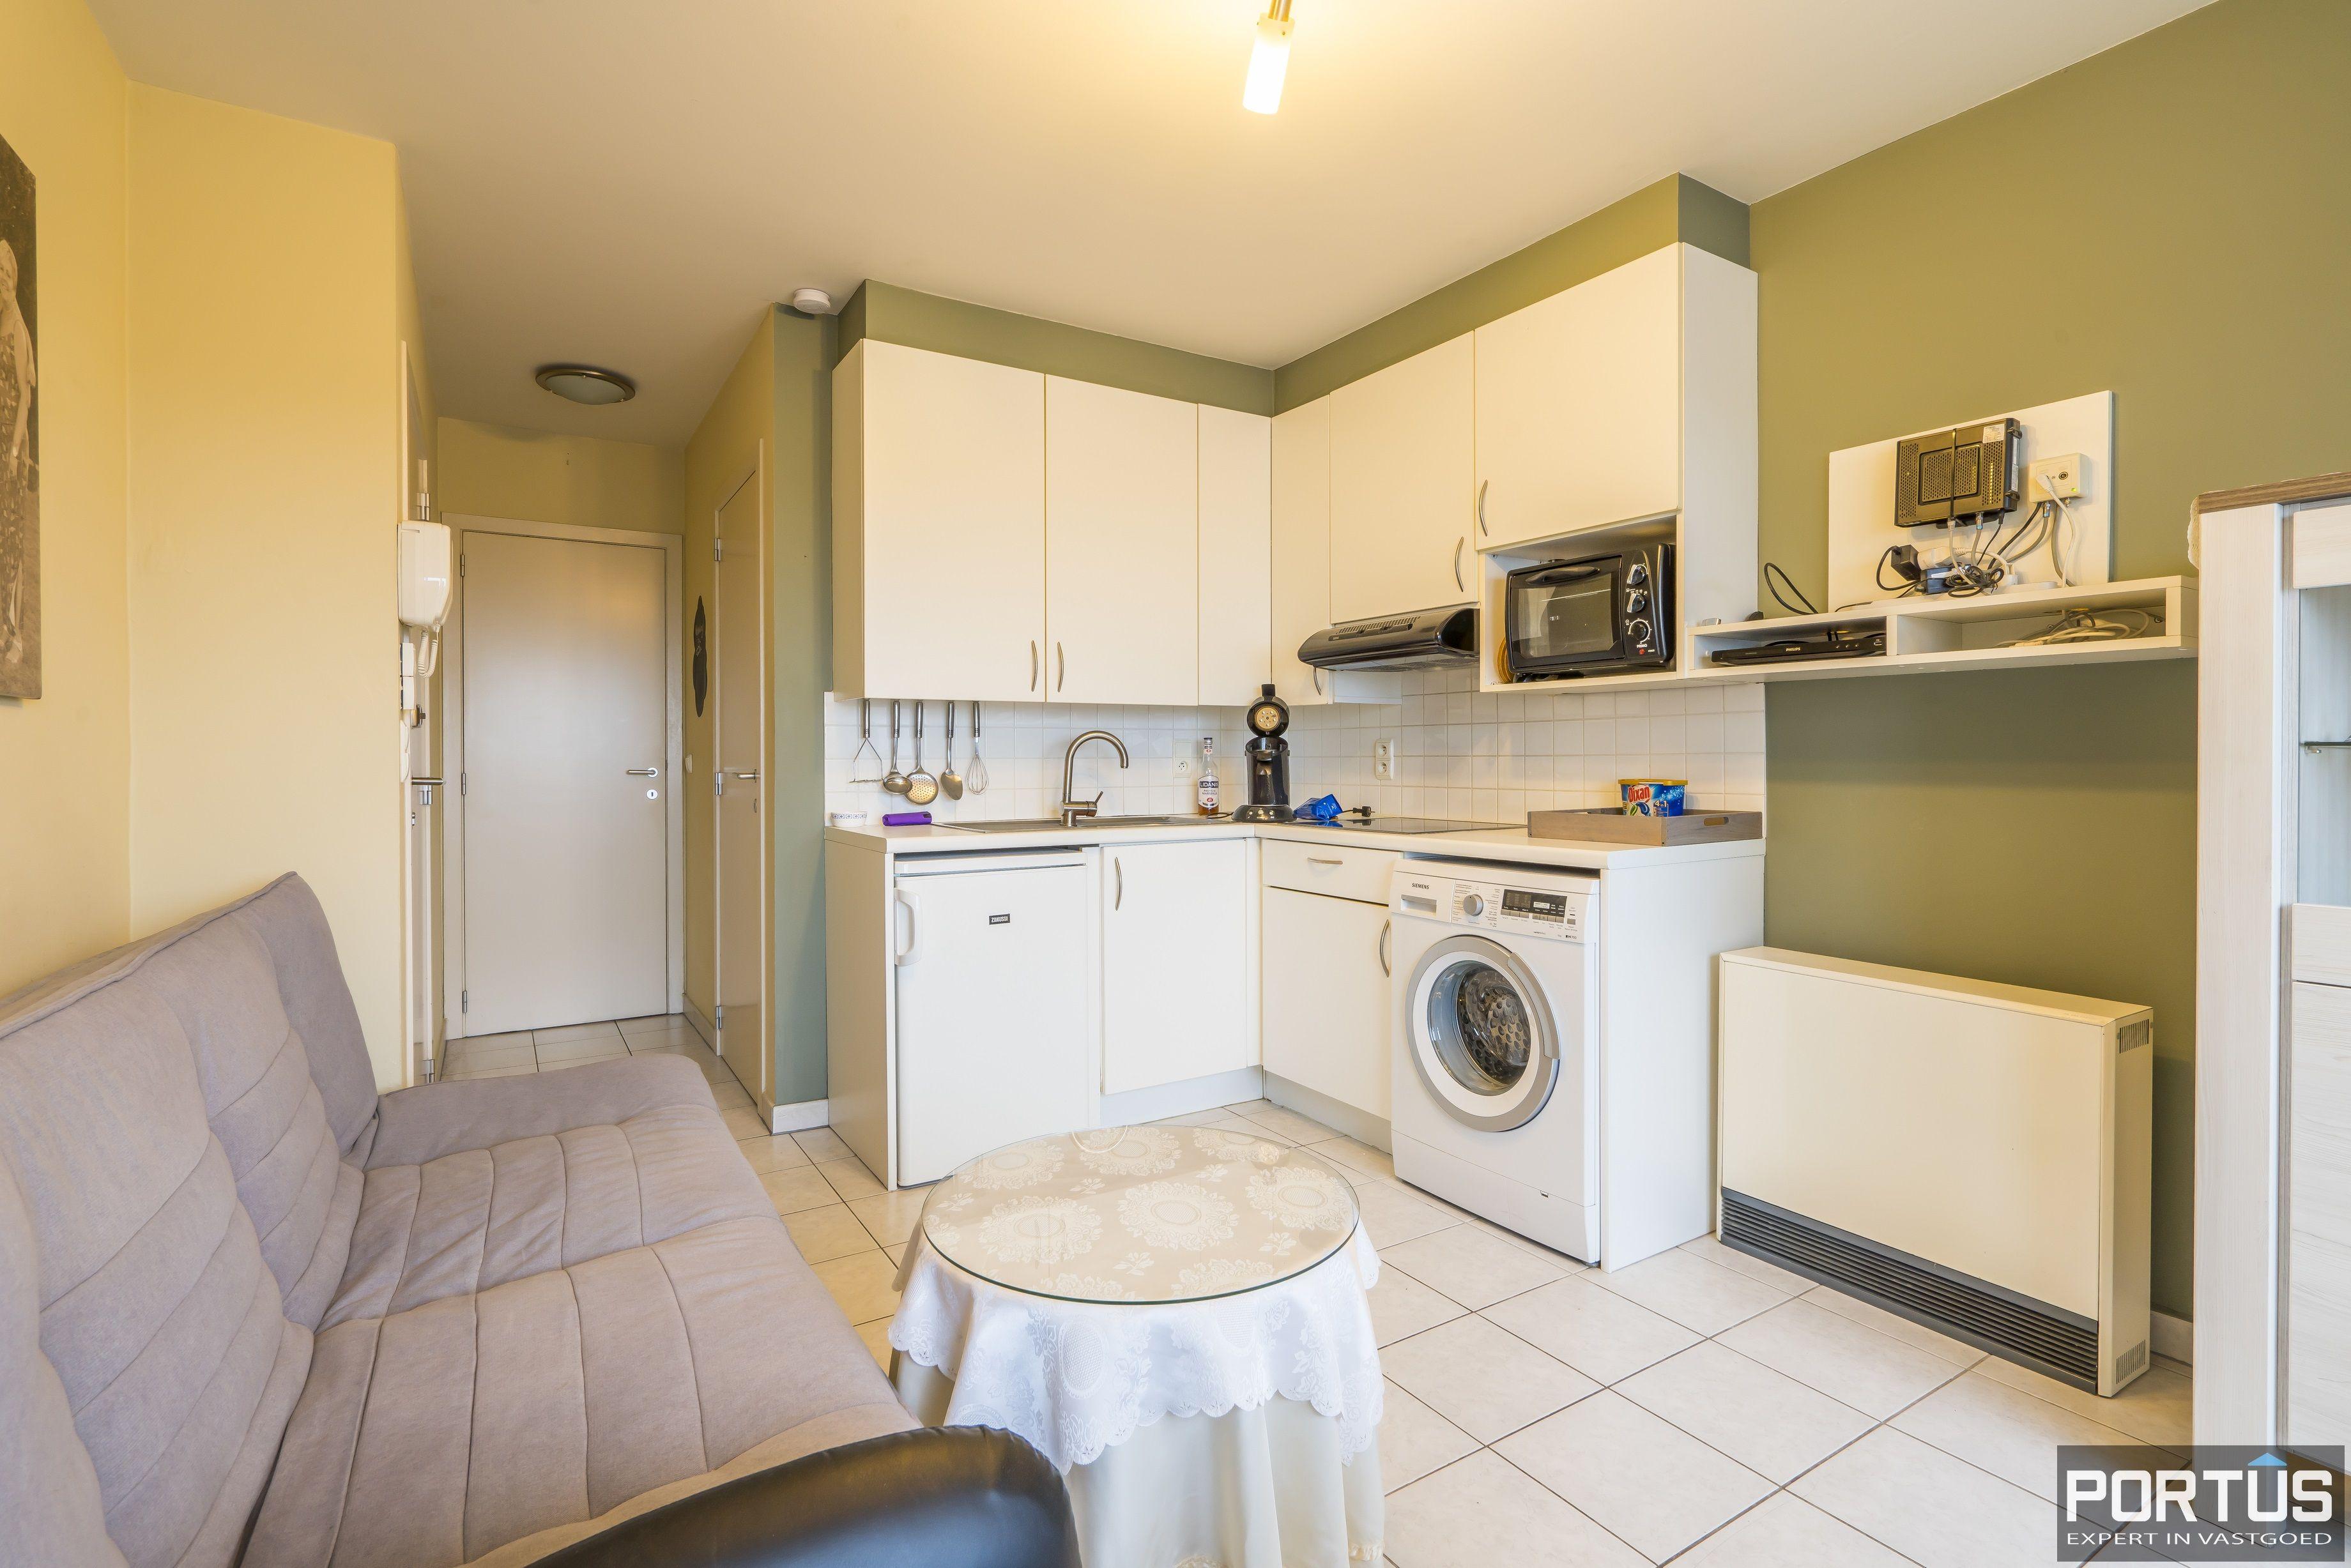 Instapklaar appartement met 1 slaapkamer te koop te Westende - 12058